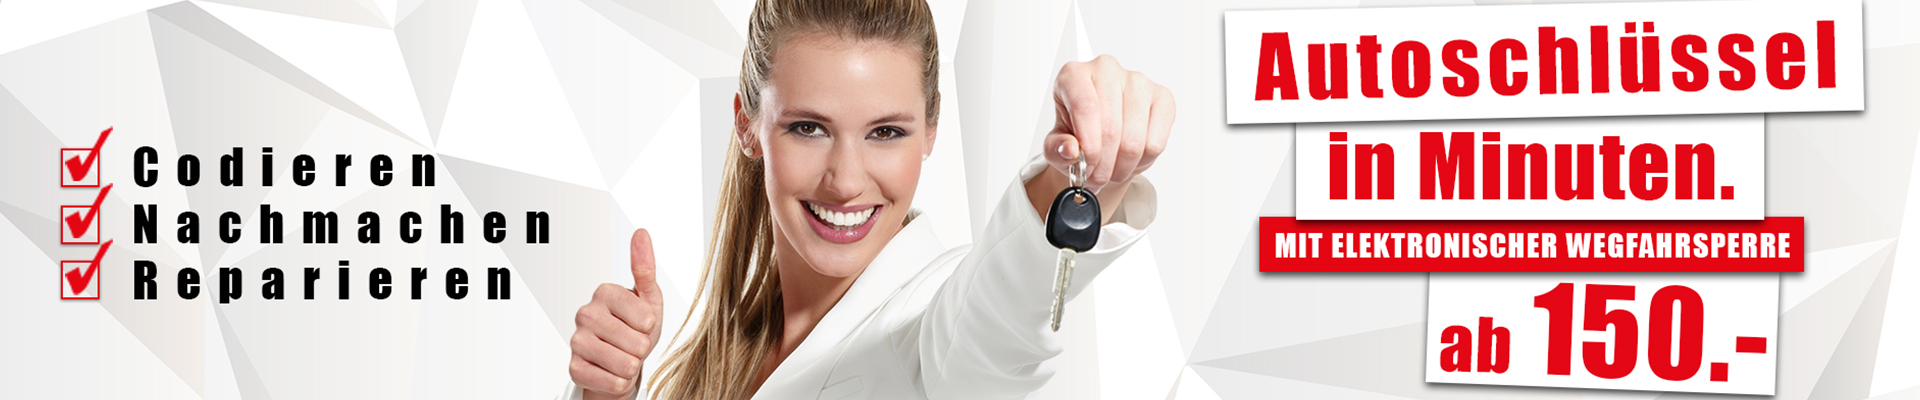 GSB Produktions GmbH Autoschluessel